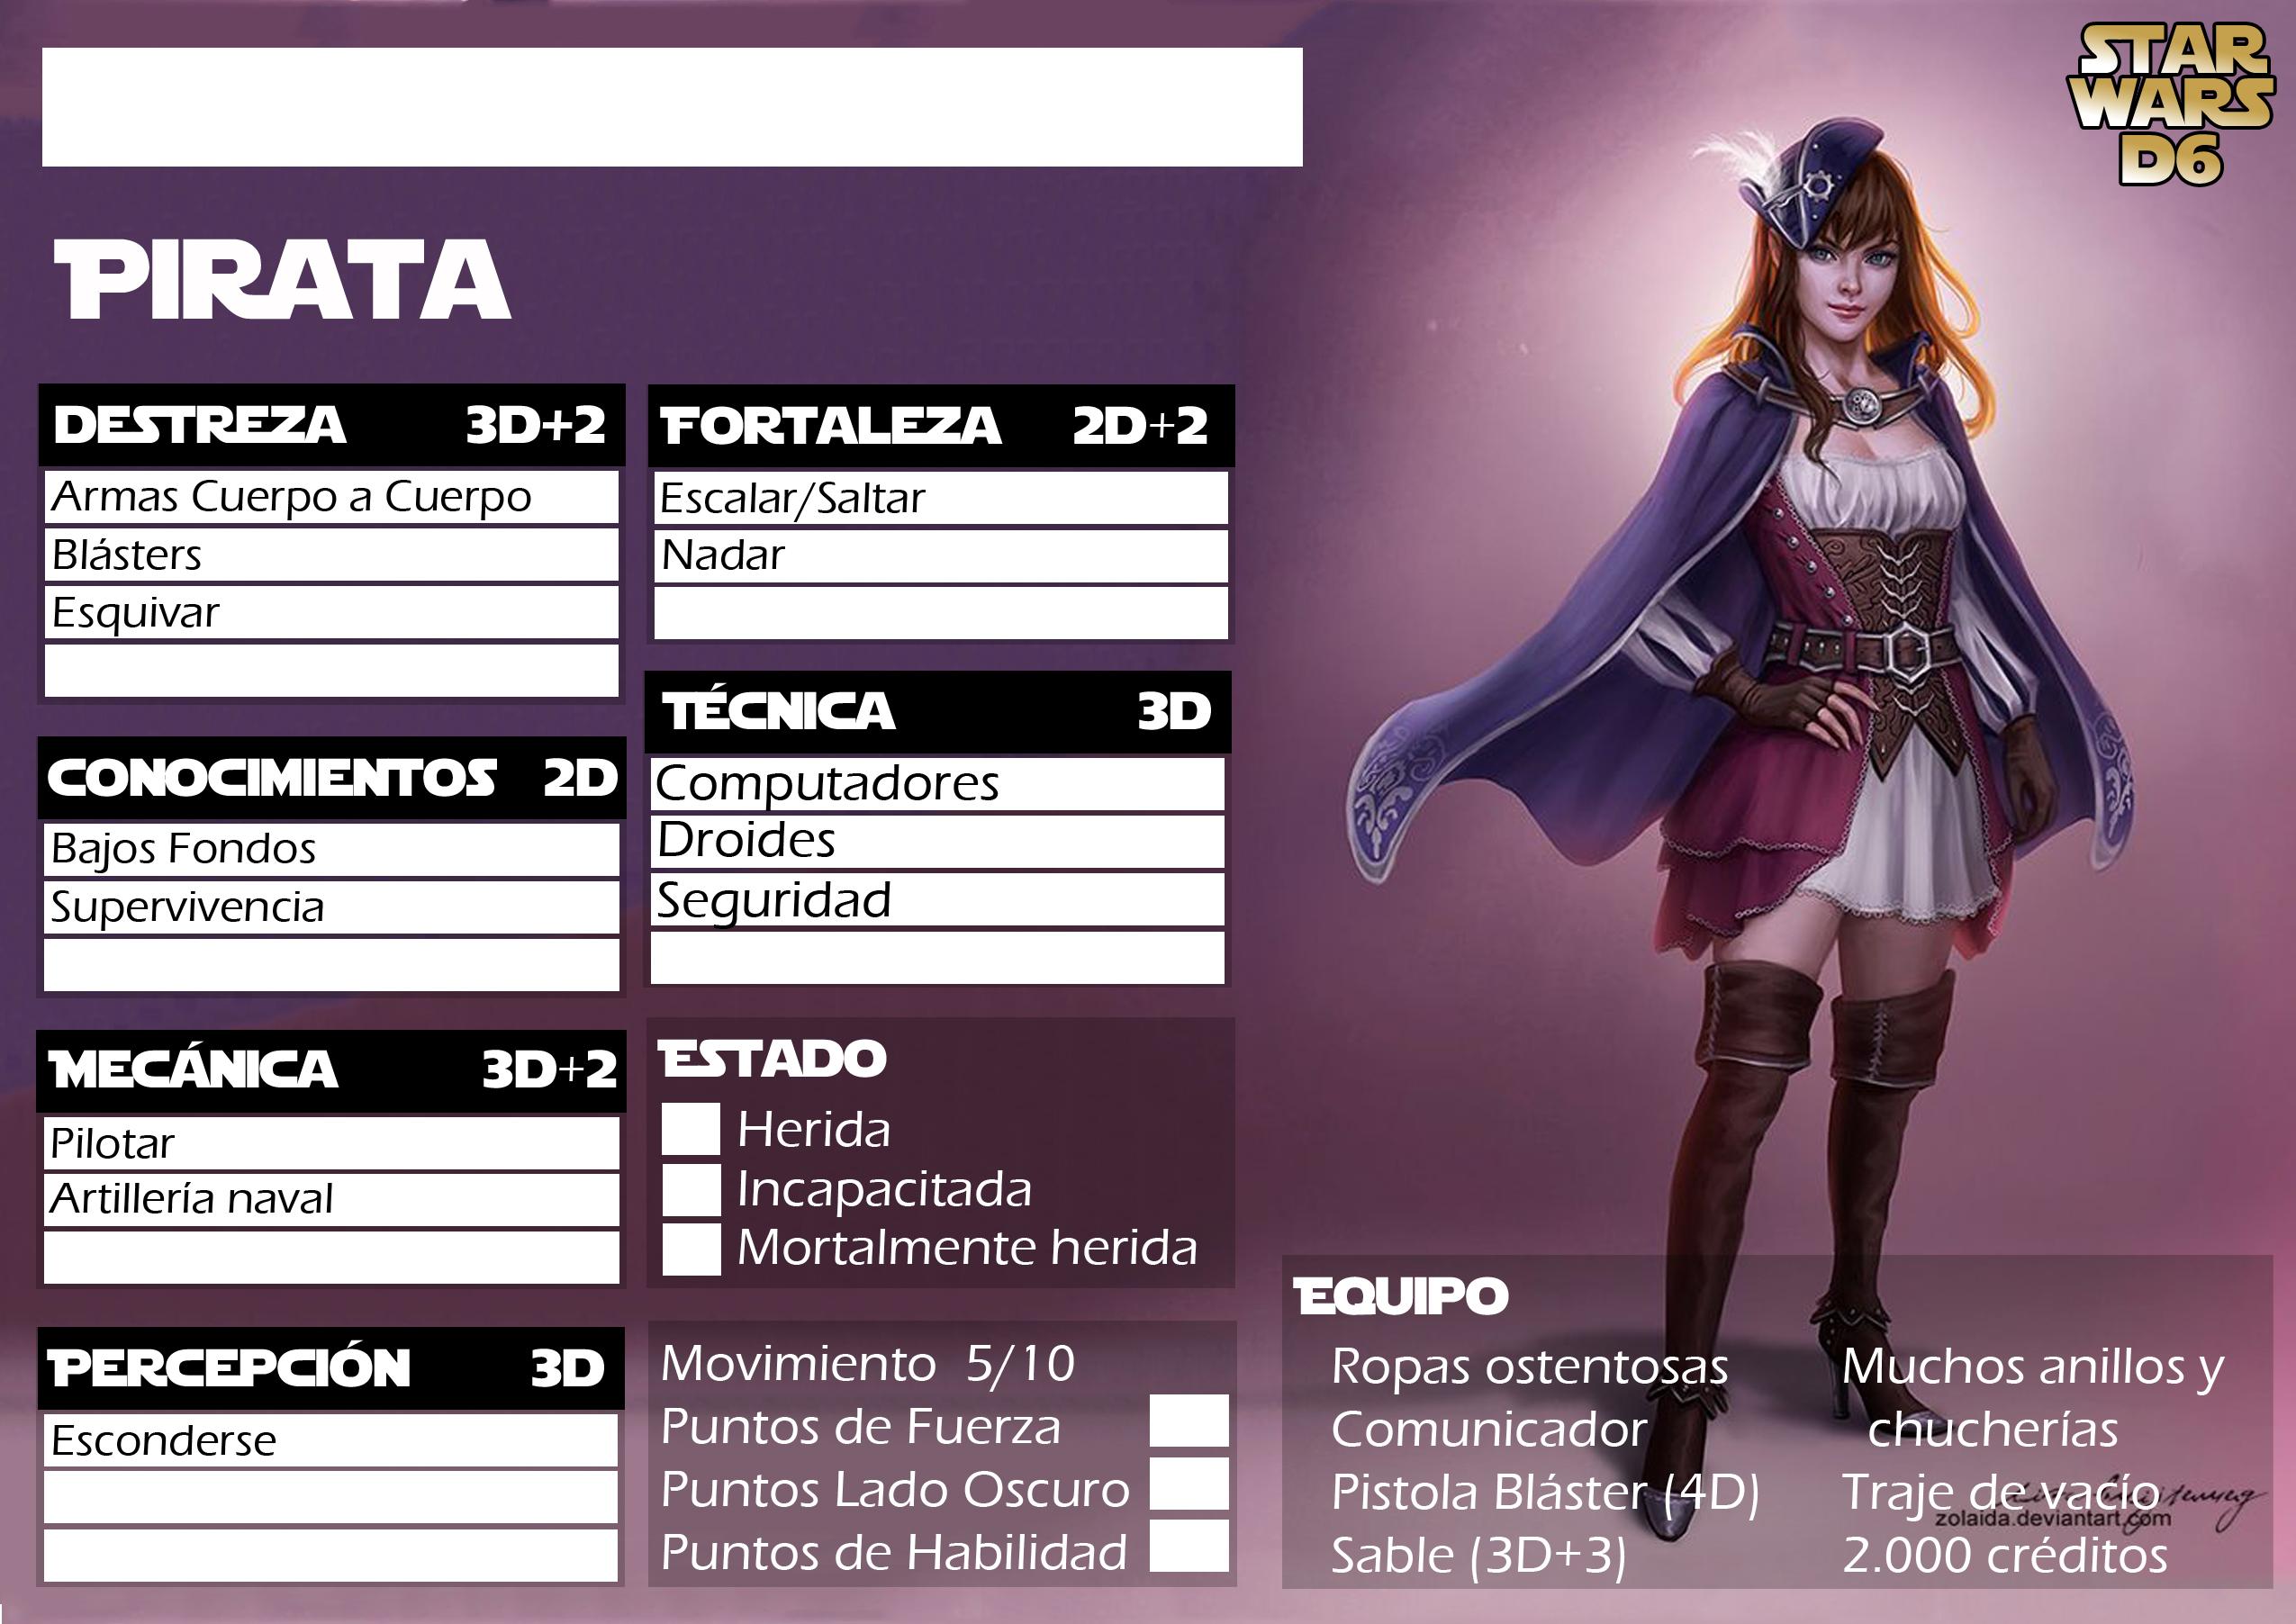 Ficha de Pirata